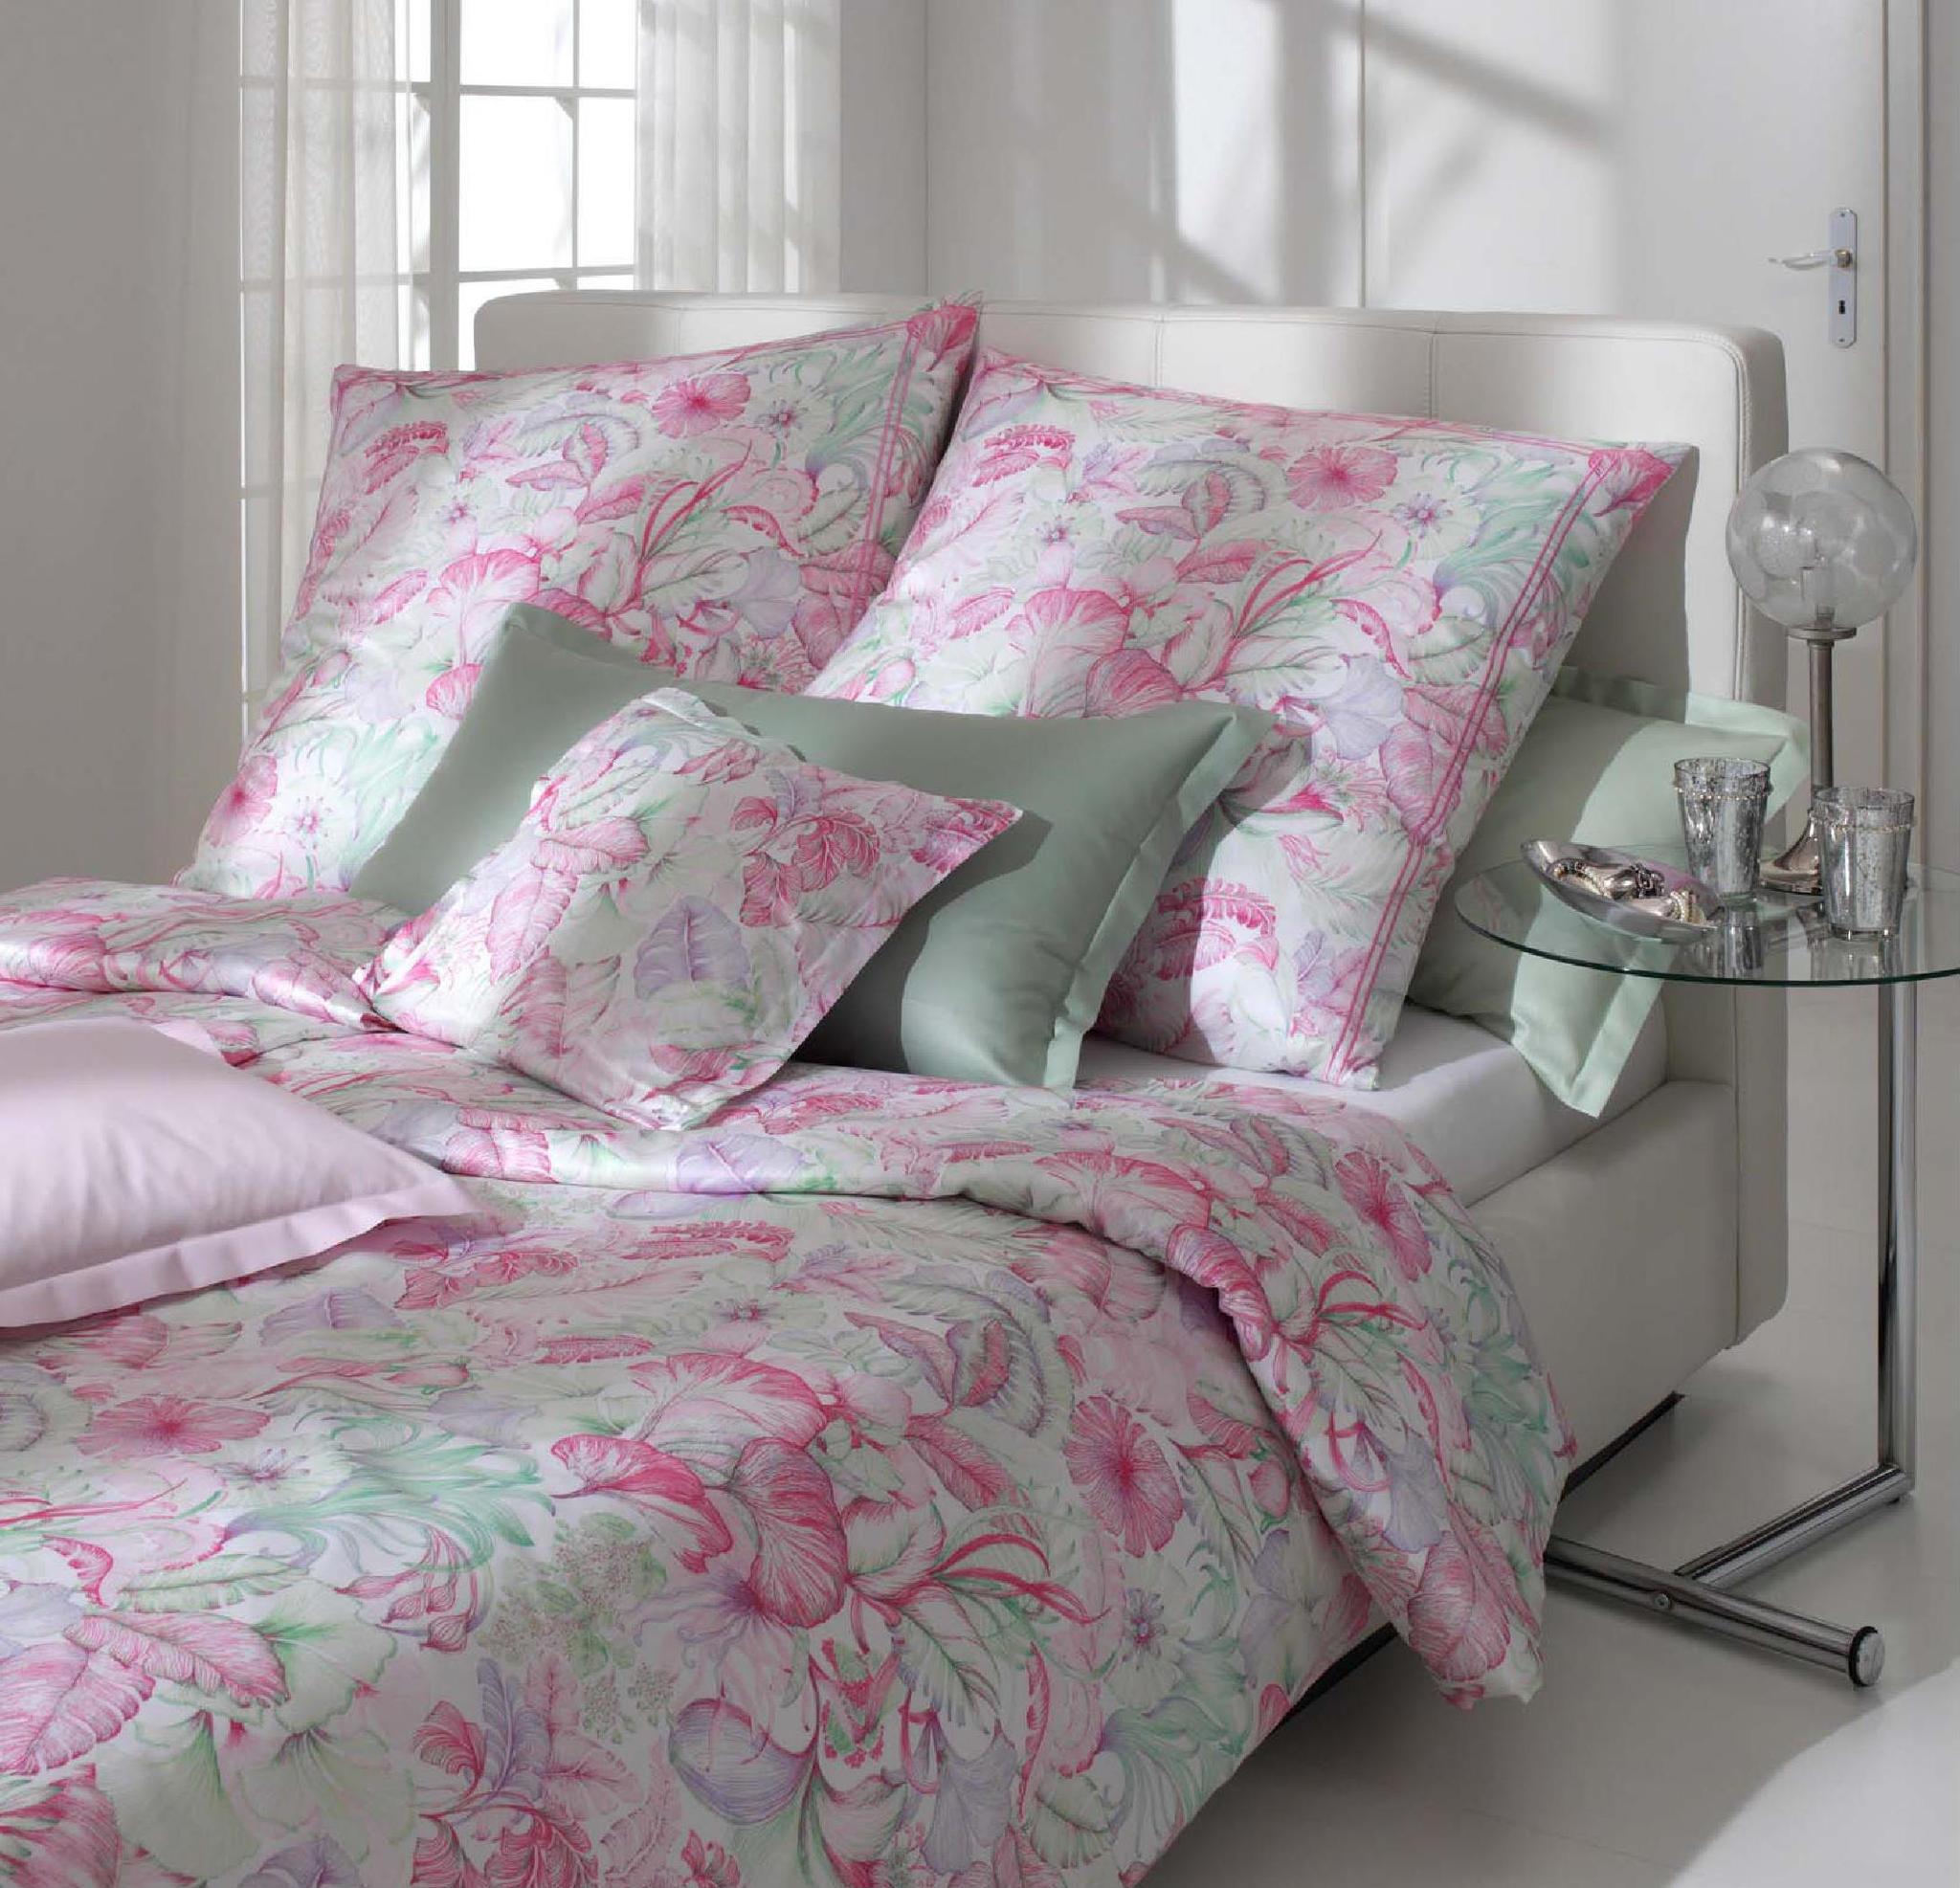 Для сна Наволочка 50x70 Elegante Antiqua розовая elitnaya-navolochka-antiqua-rozovaya-ot-elegante-germaniya.jpg